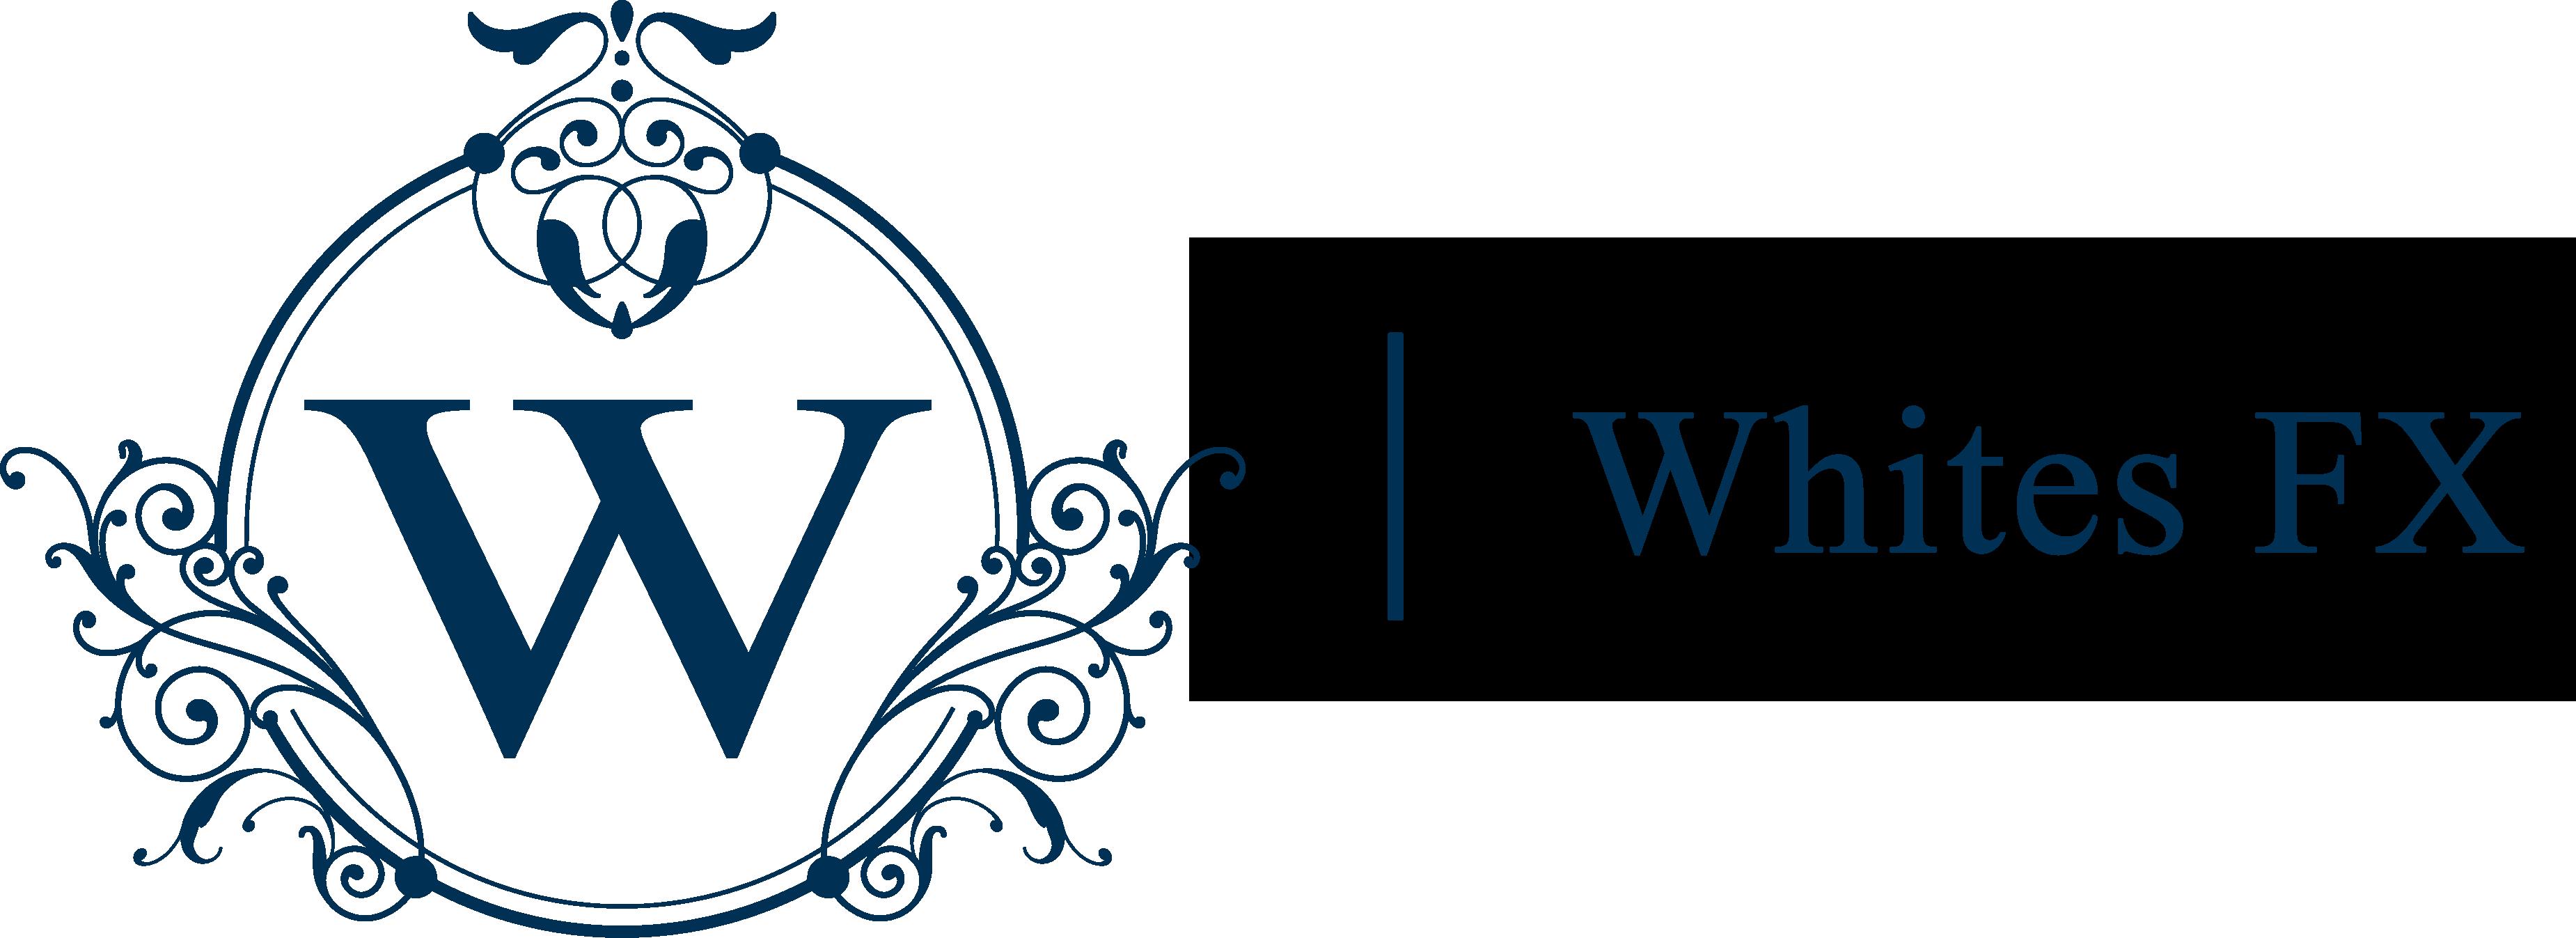 Logolinewhitesfx.png